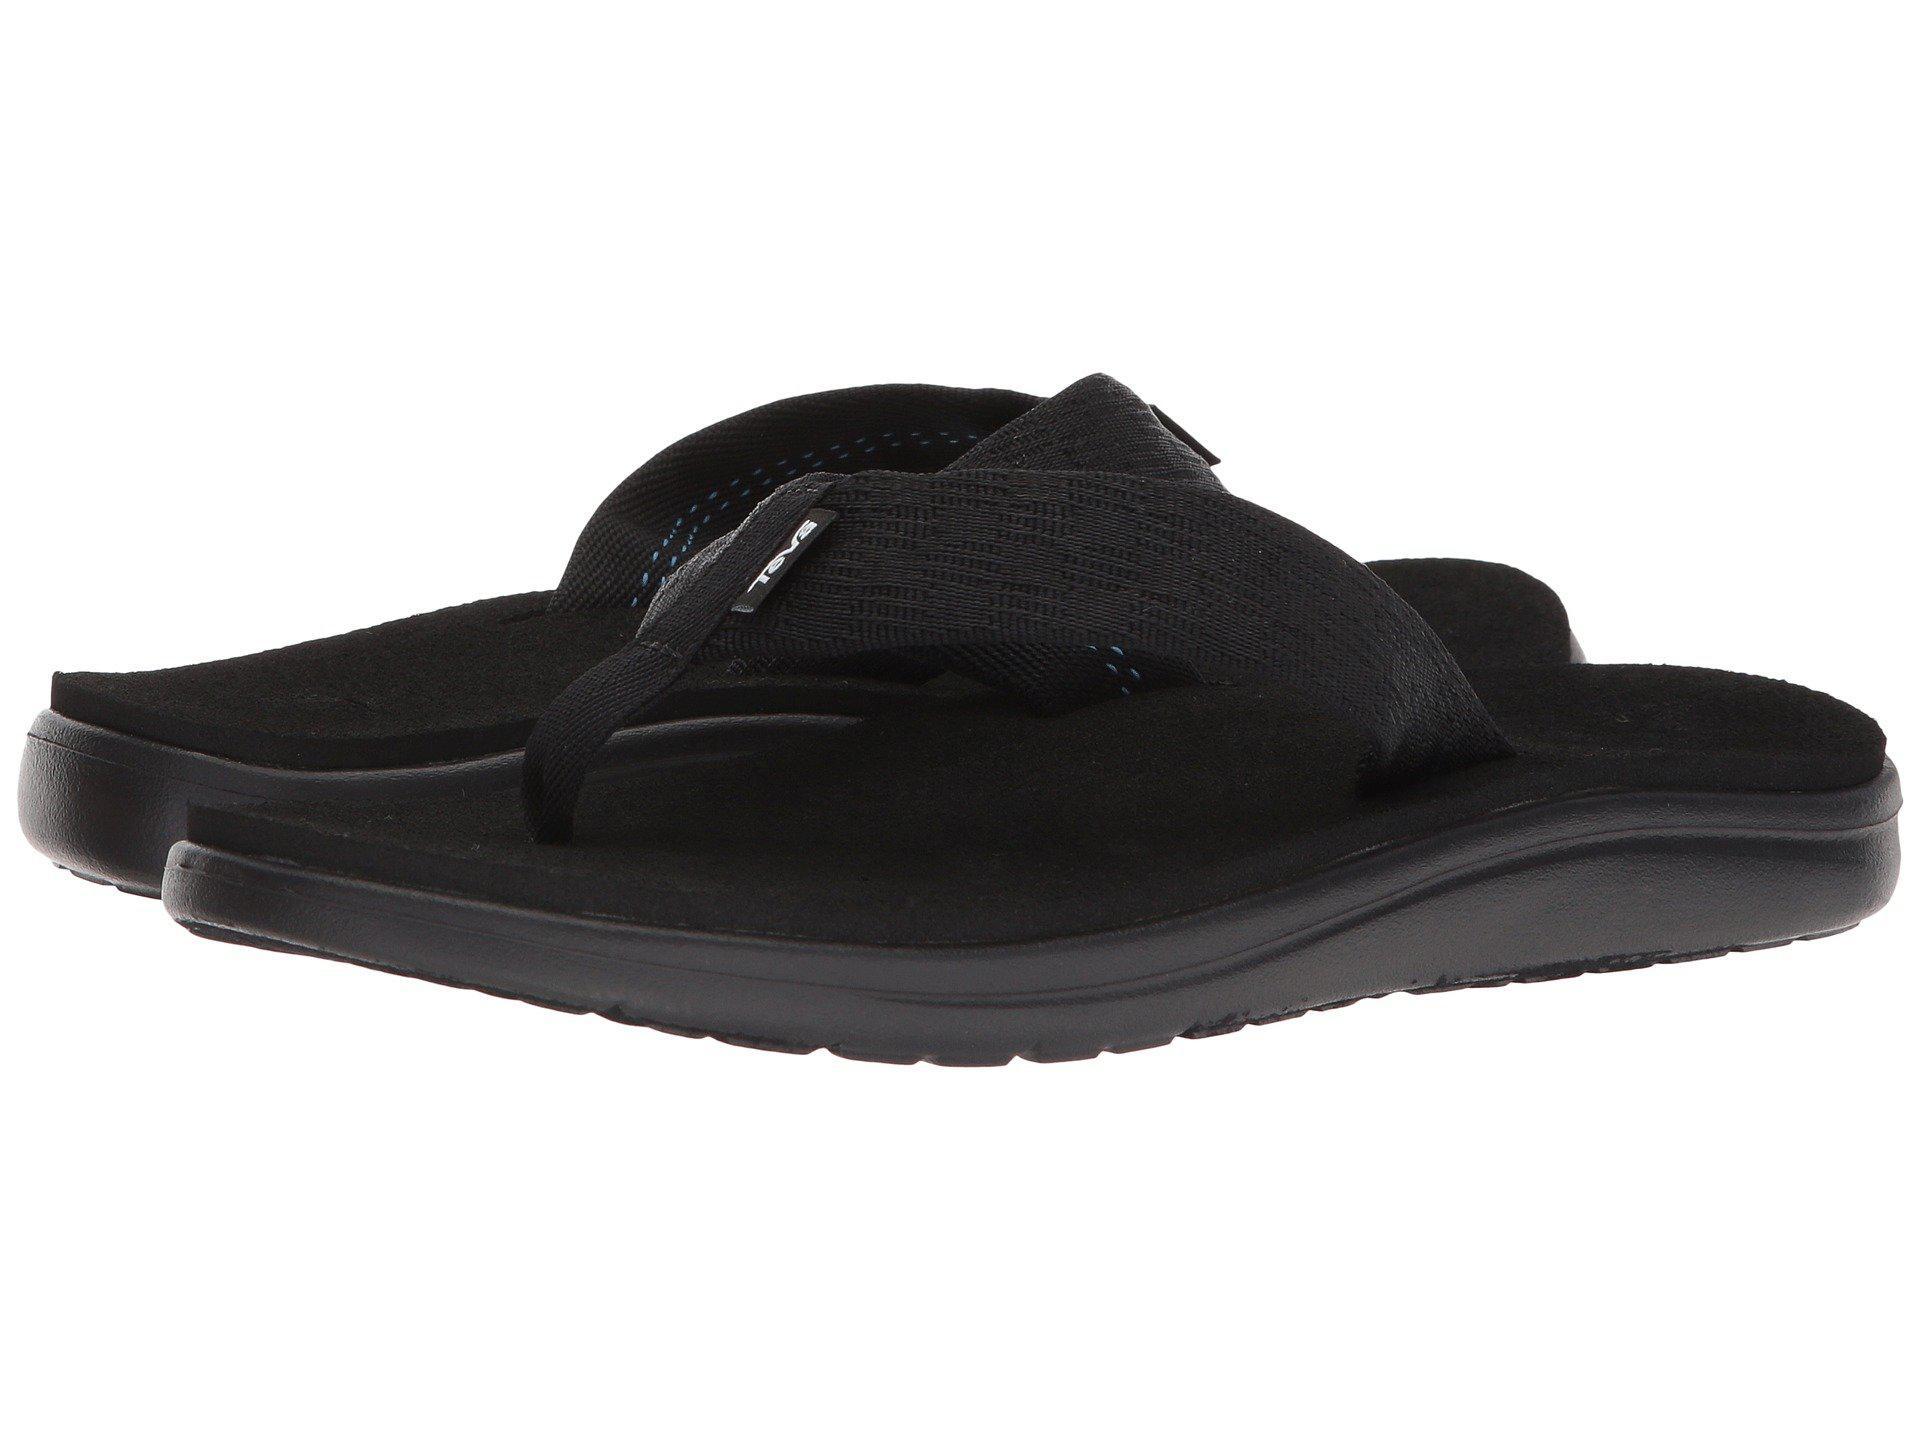 bb9bdfe199a5 Lyst - Teva Voya Flip (zook Black) Men s Sandals in Black for Men